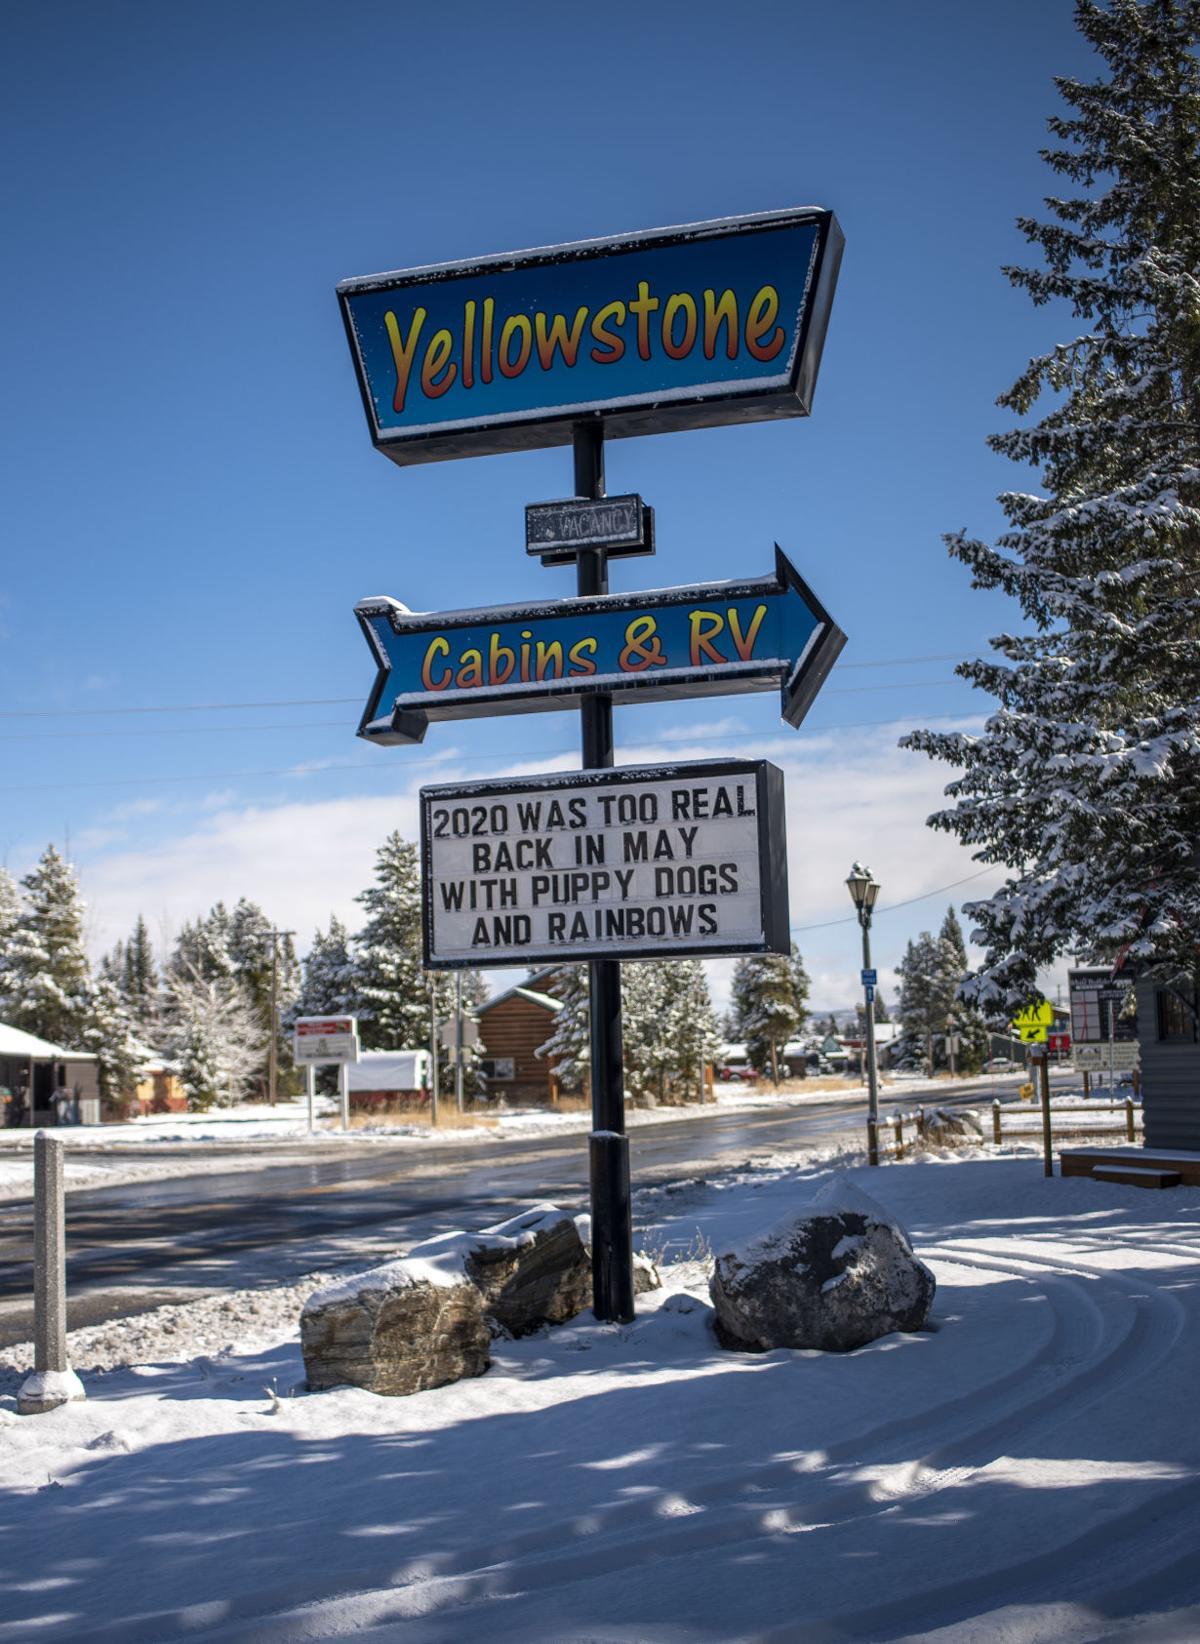 Last days in Yellowstone, 2020